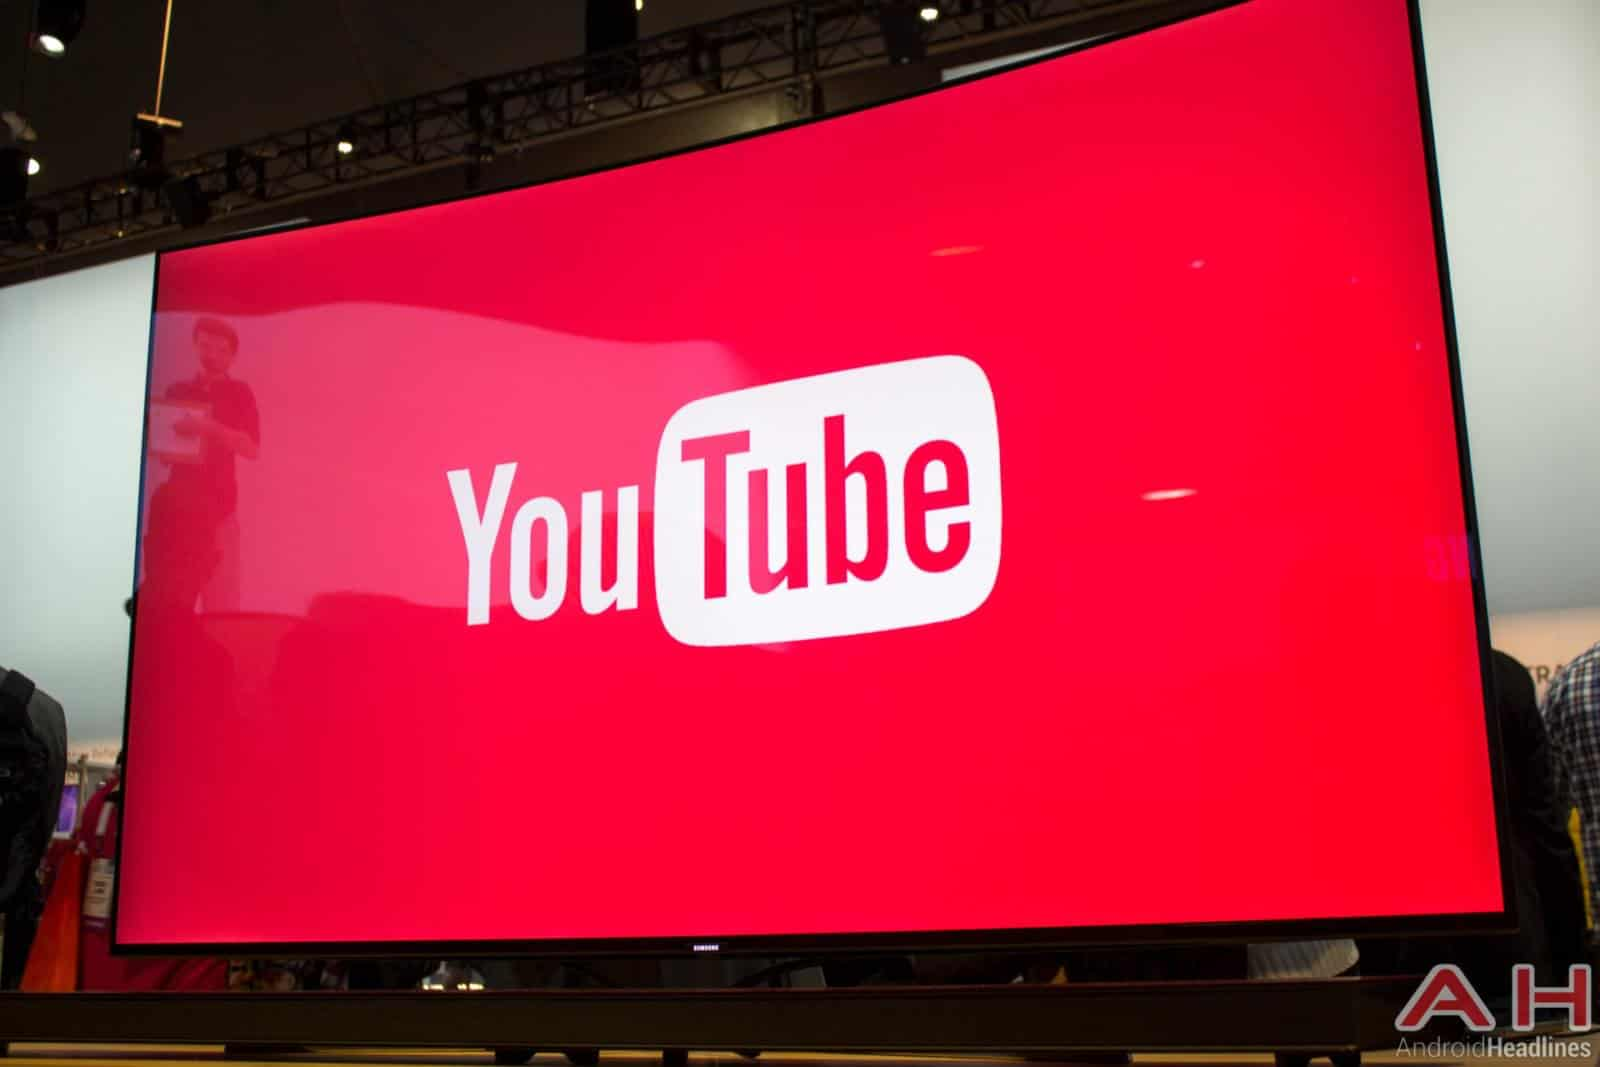 YouTube Logo AH big screen